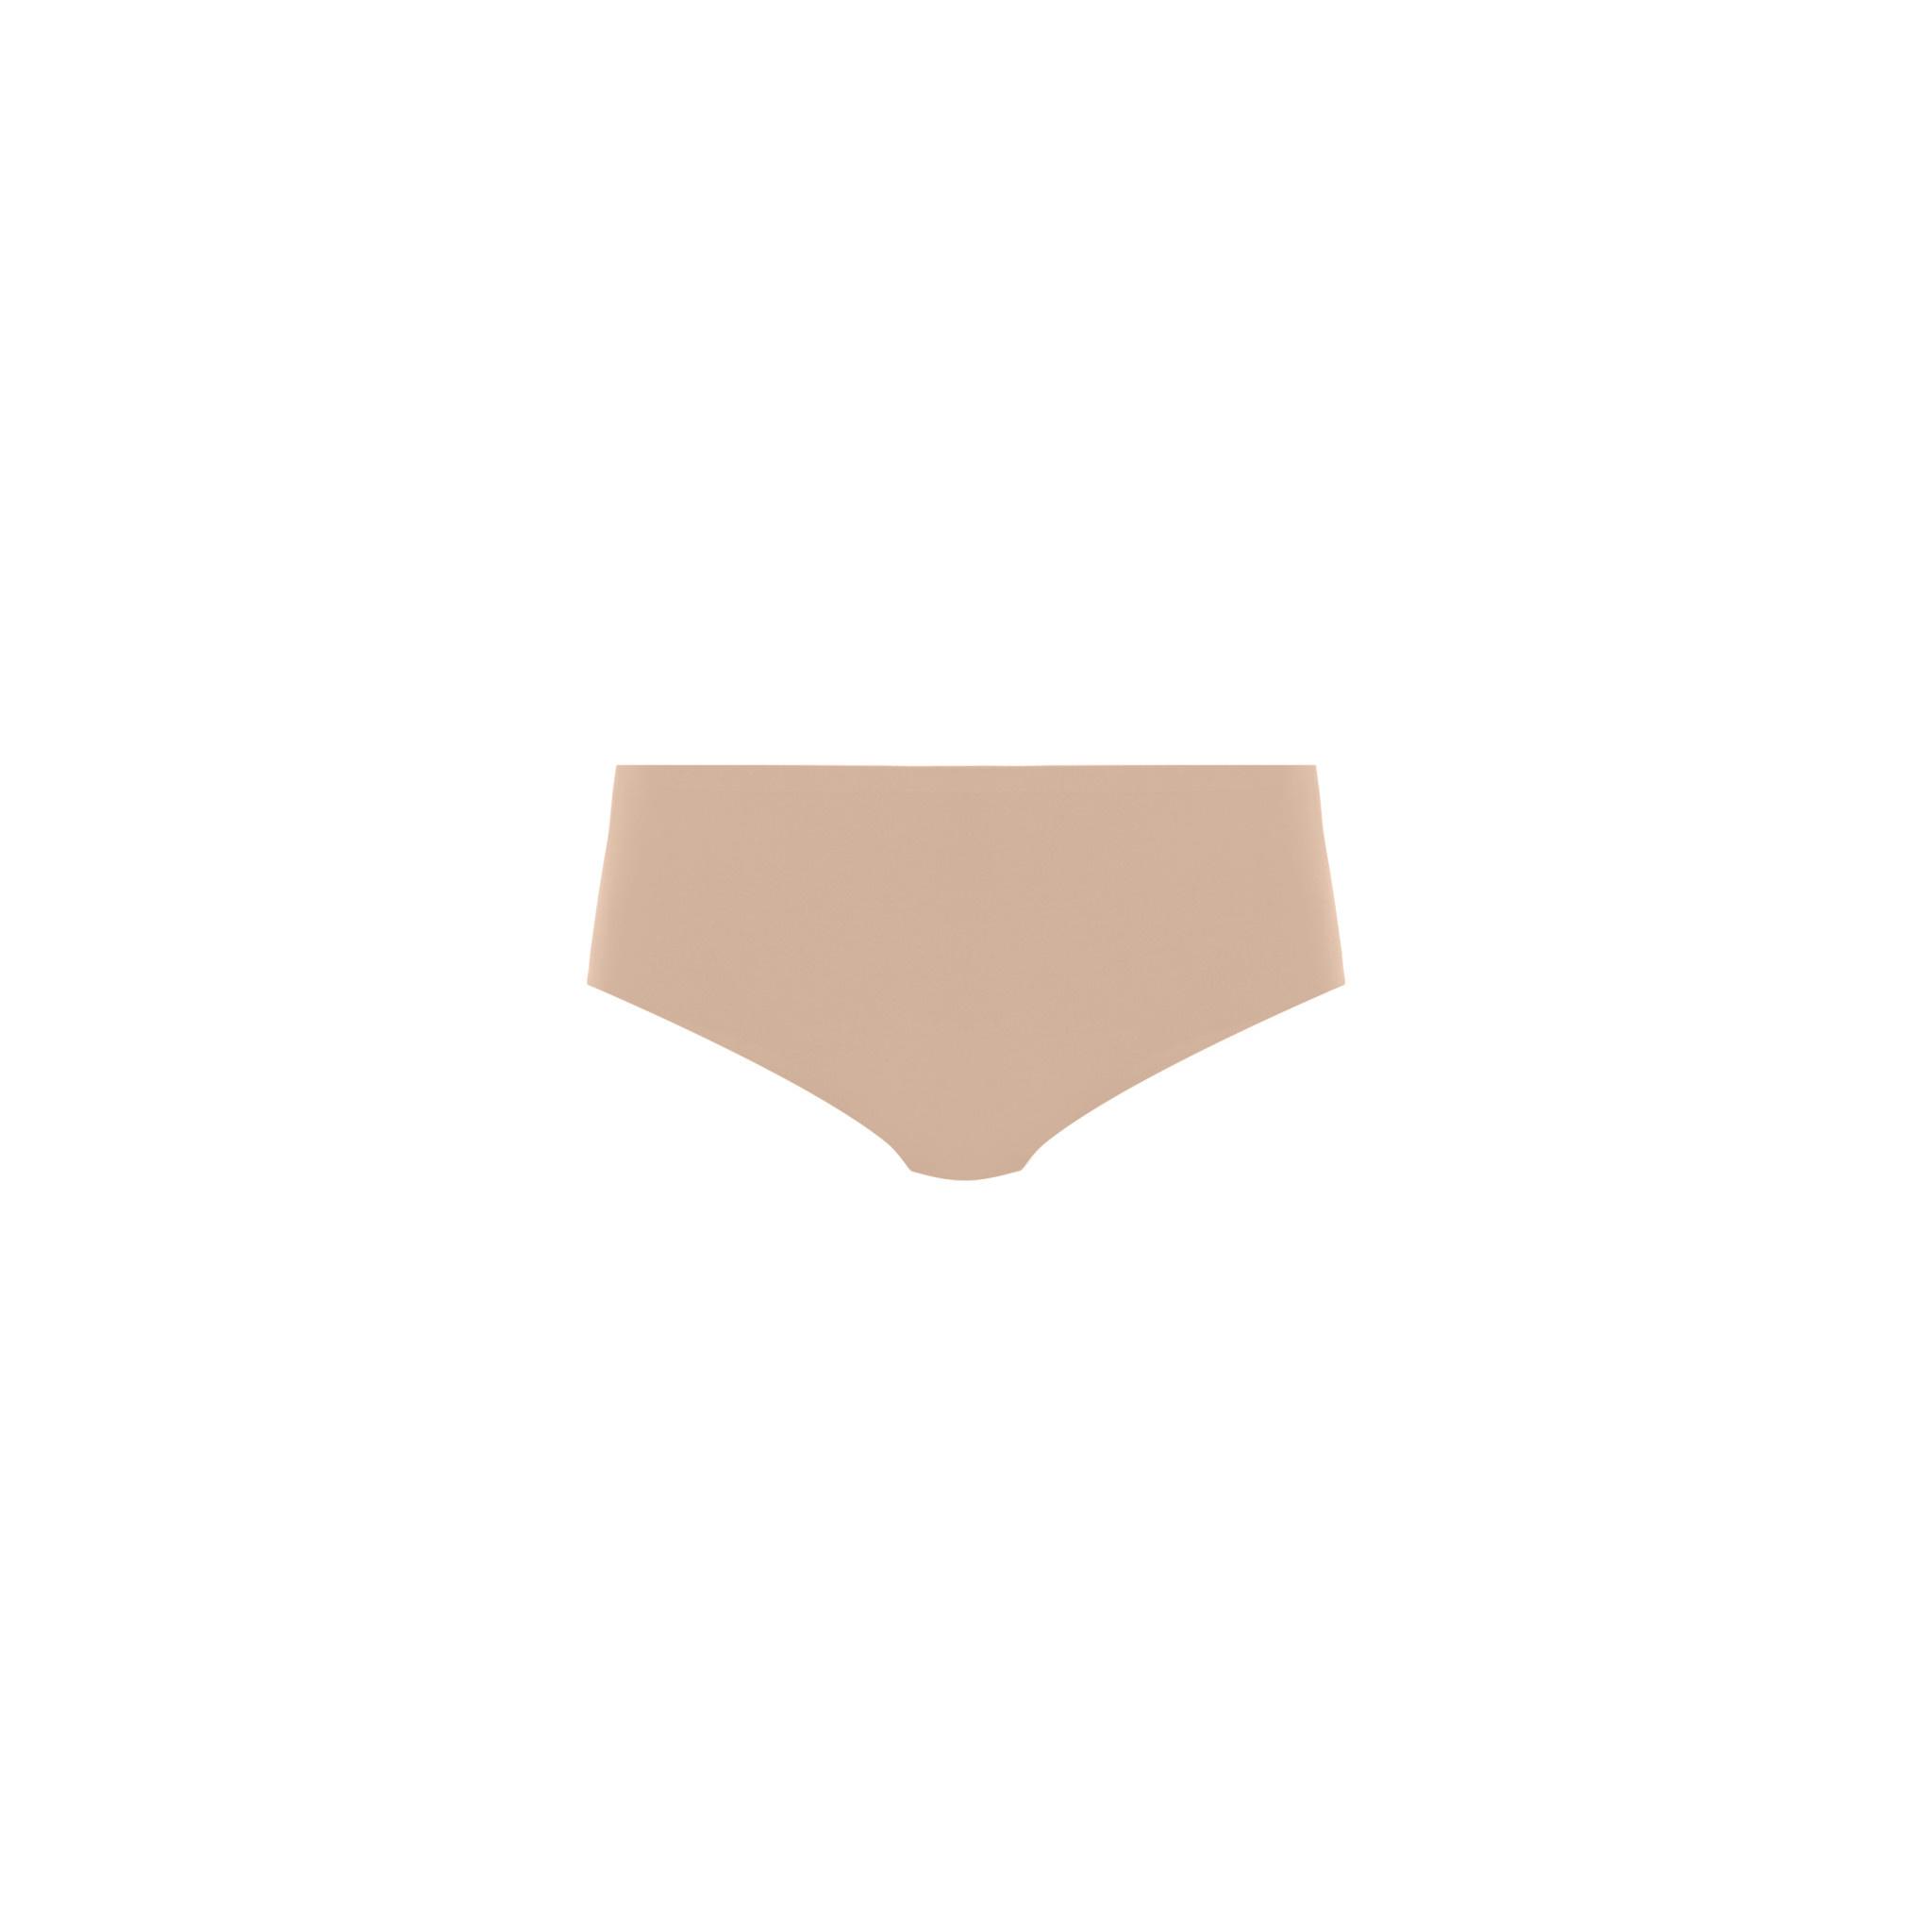 Fantasie Fantasie Smoothease Invisible Stretch Brief Nude FL2329